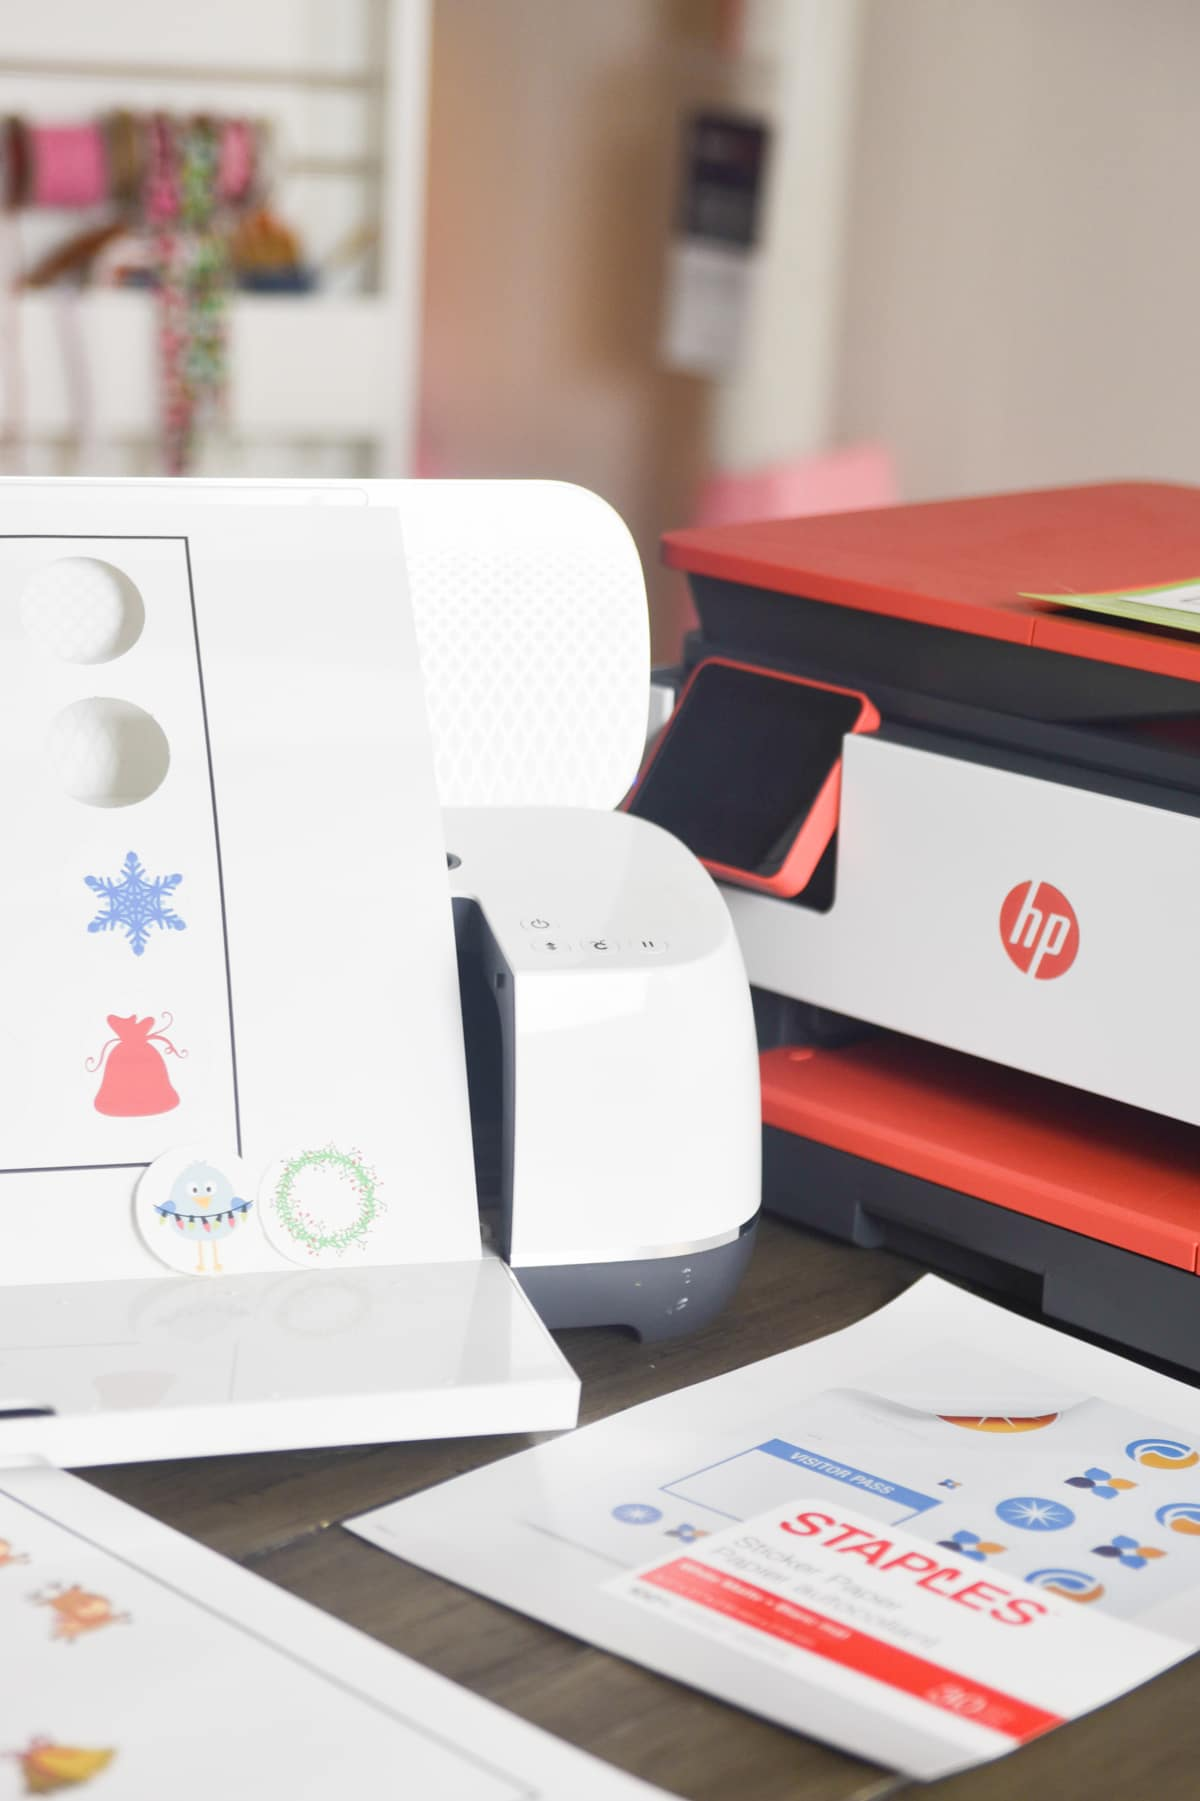 Cricut maker next to HP Printer